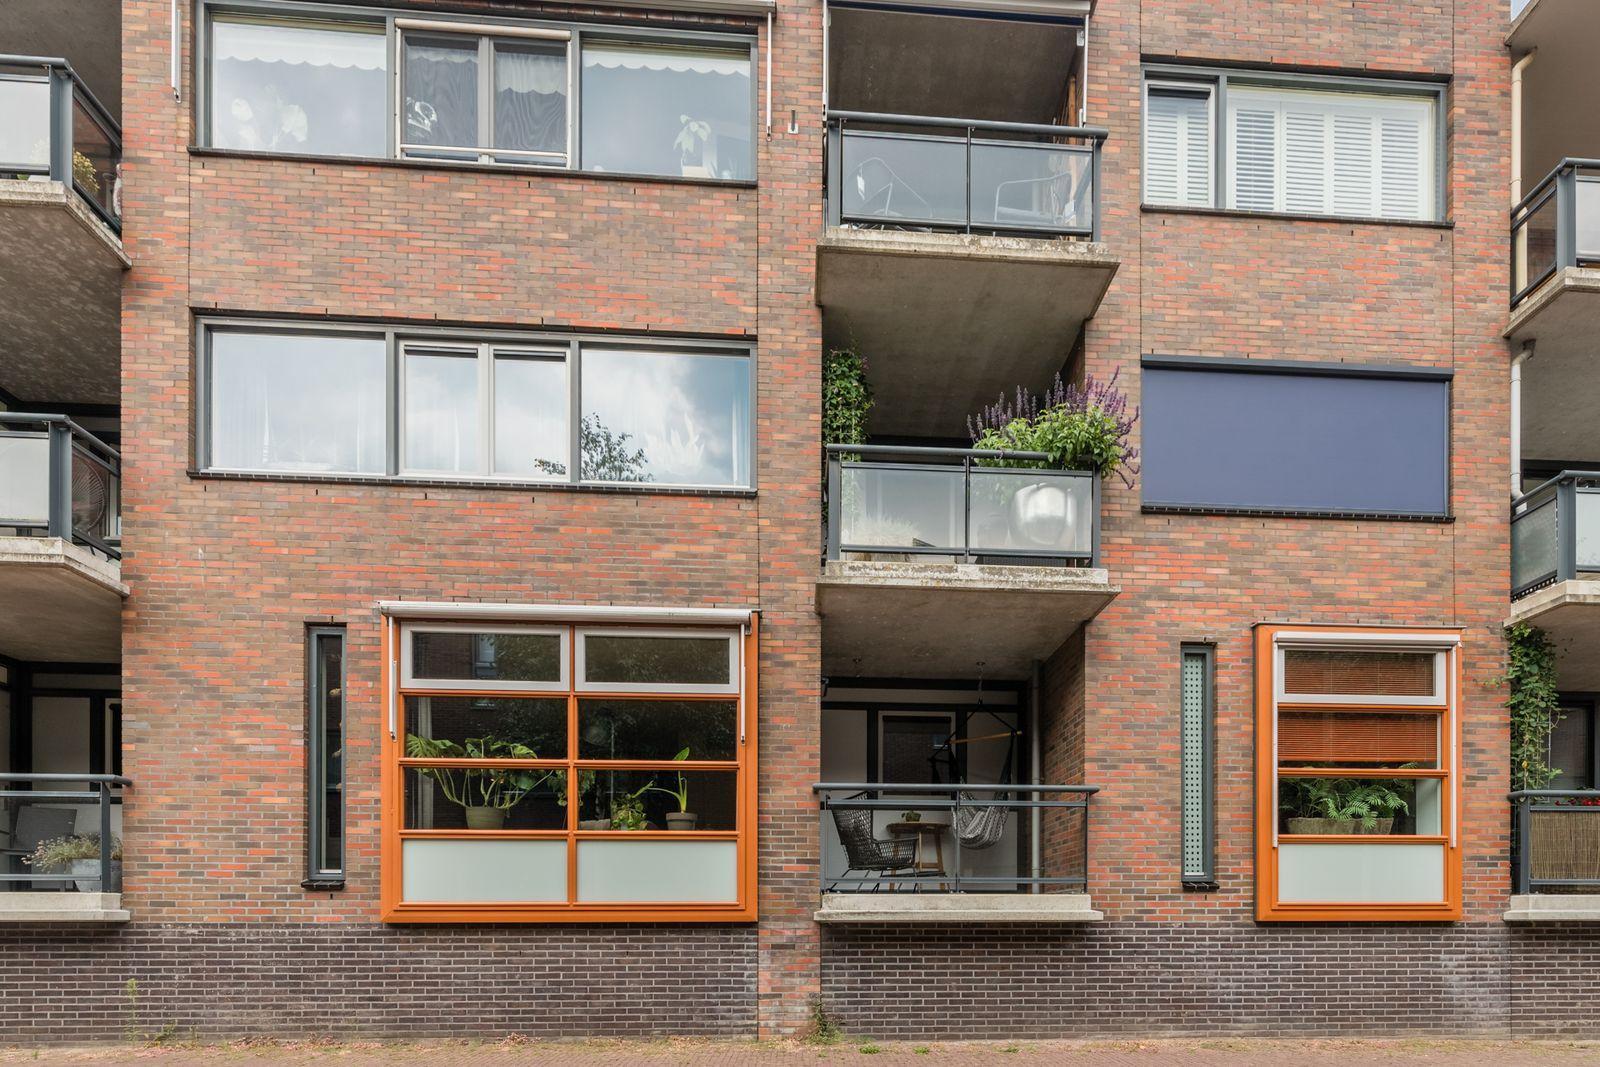 Raamstraat 71, Deventer